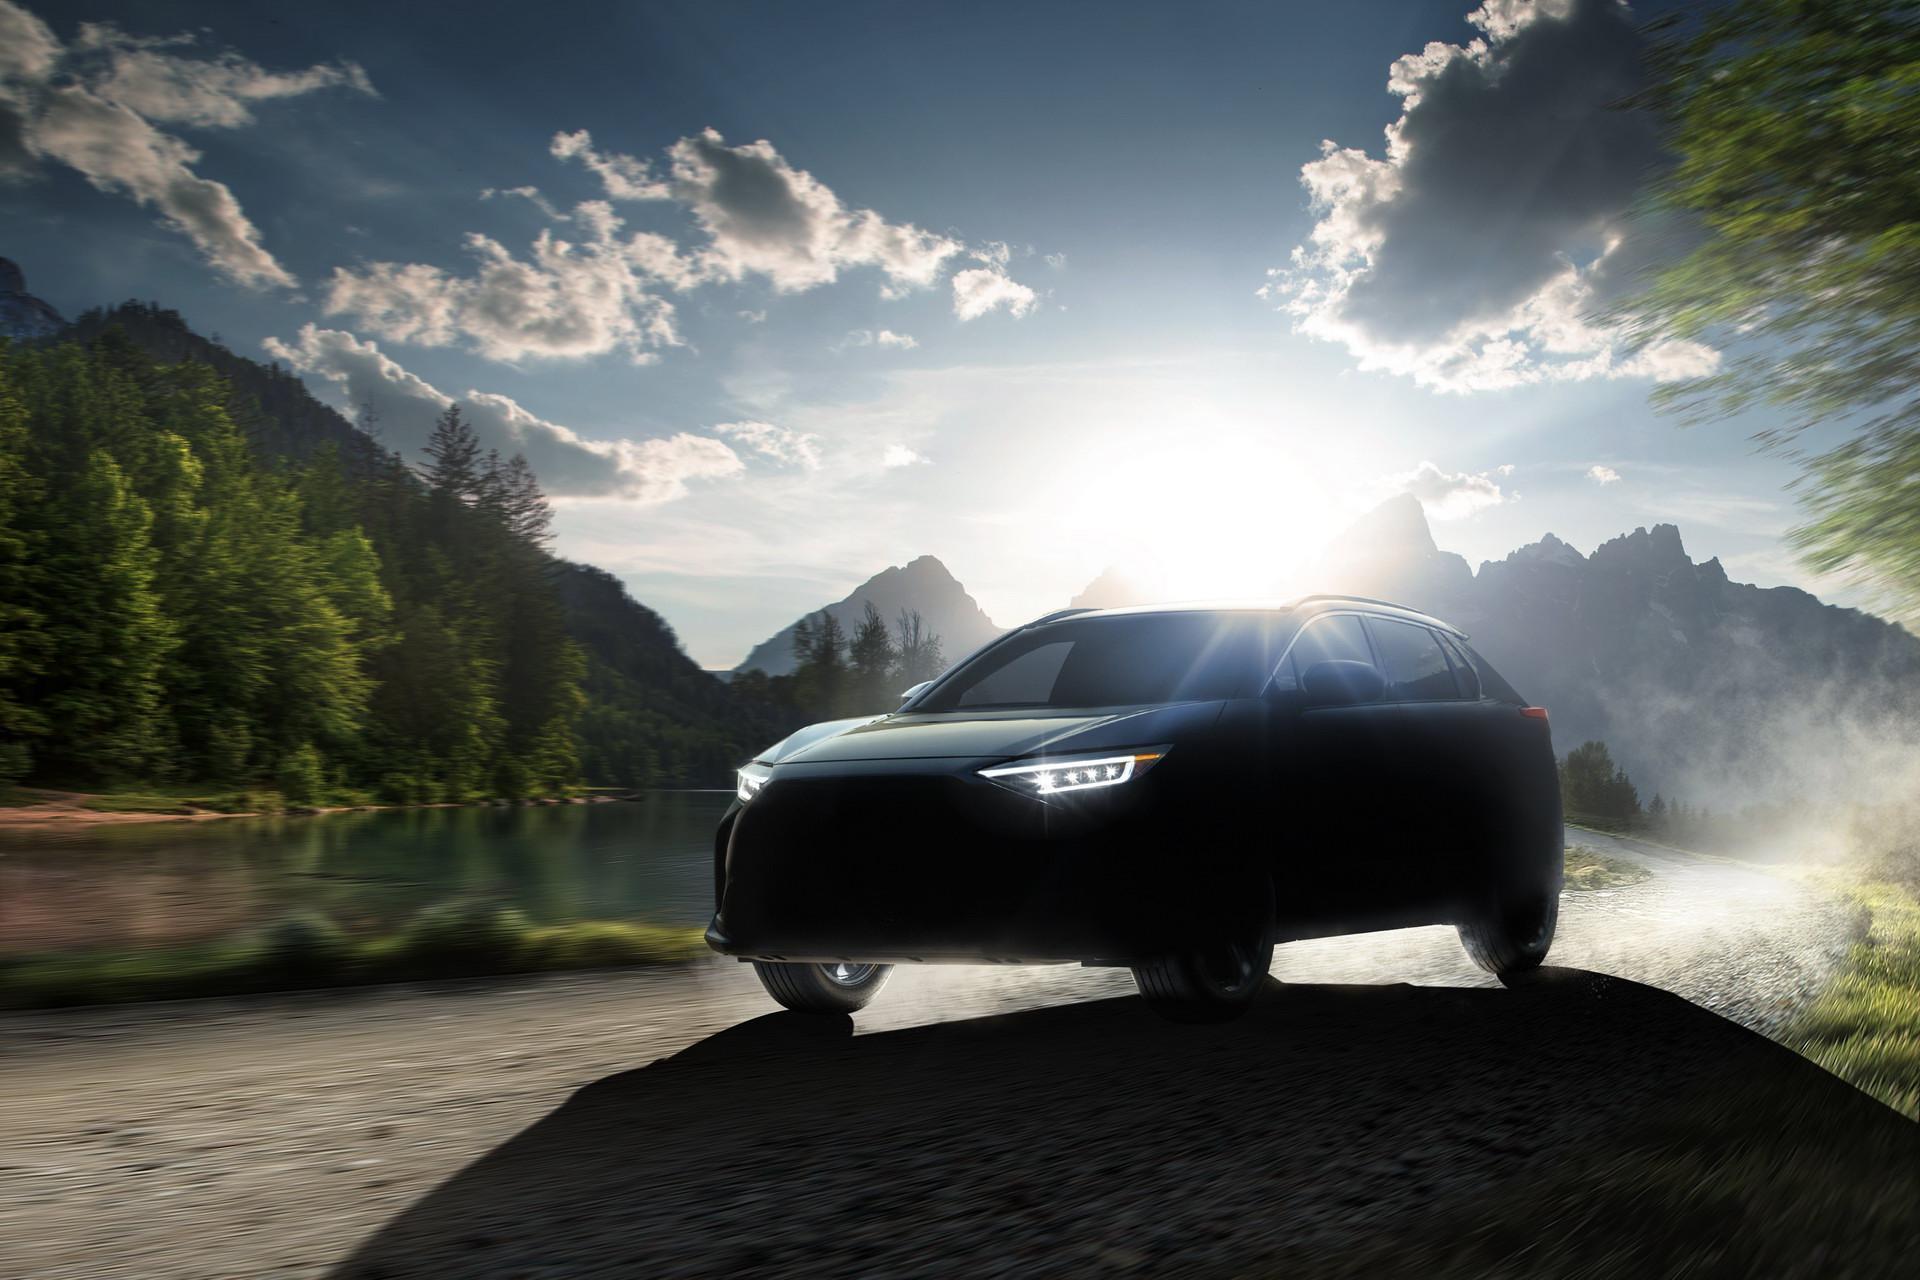 Subaru го откри името на својот електричен кросовер